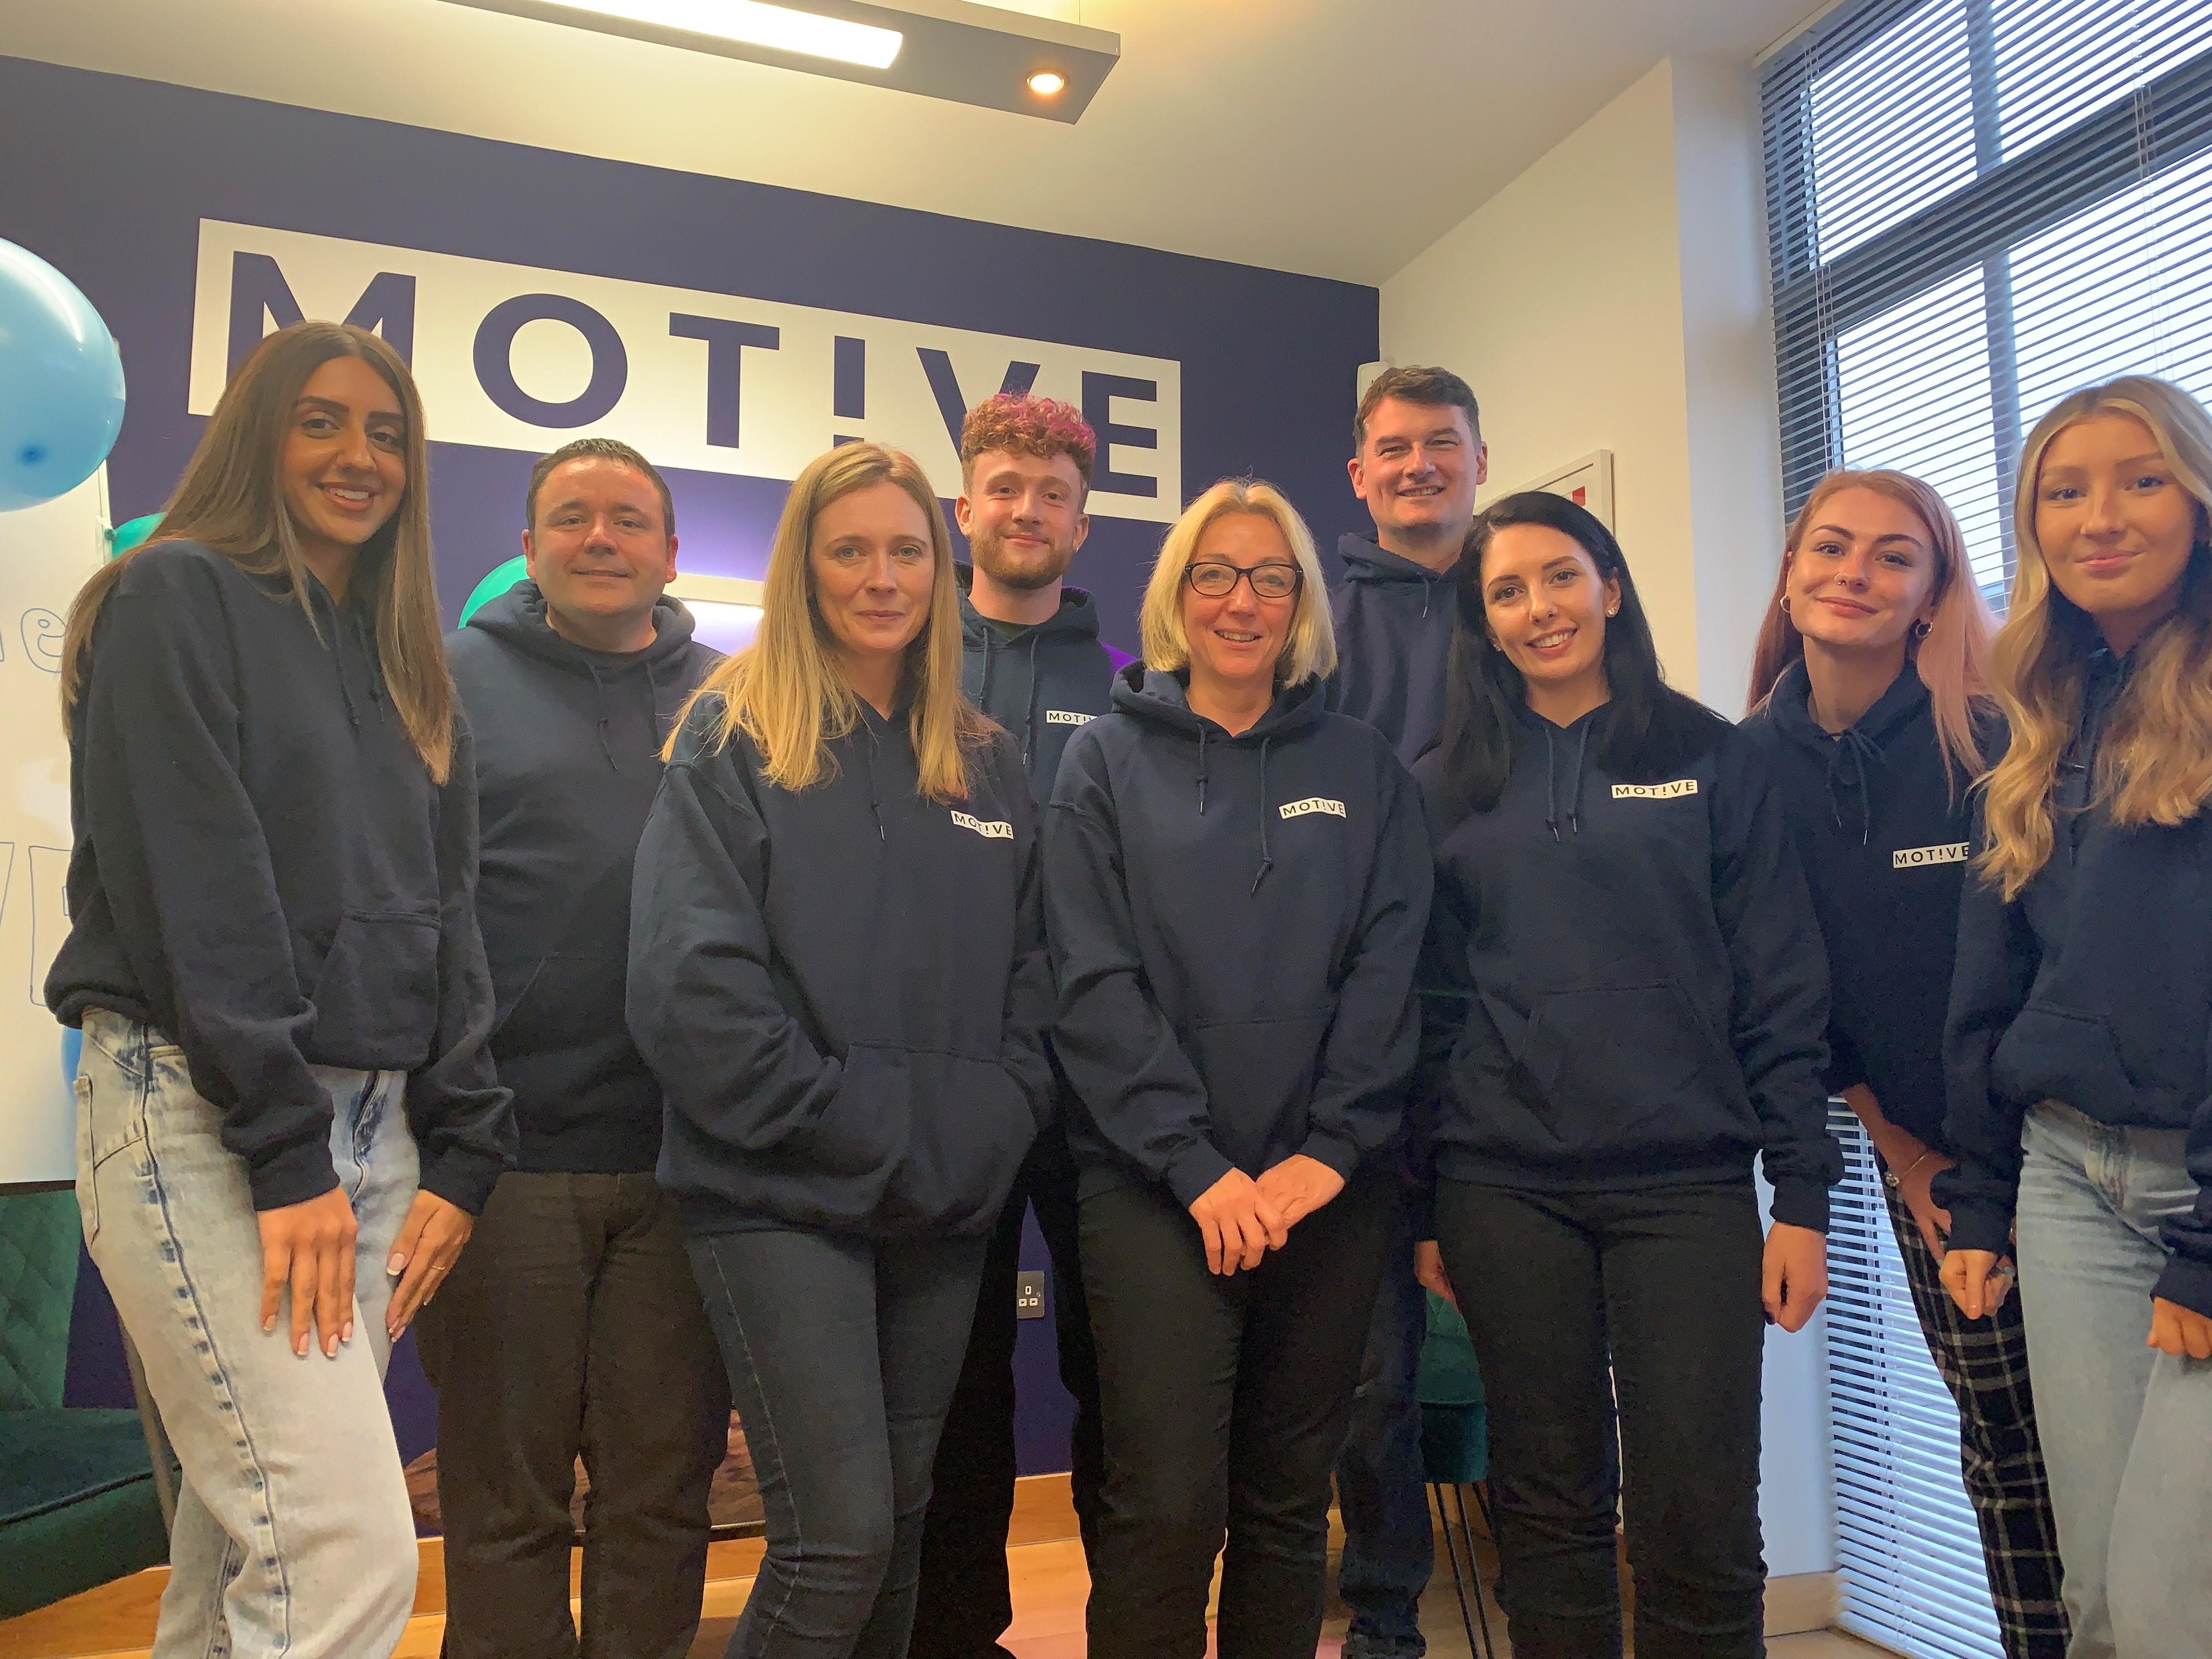 Notts PR agency named best in Midlands